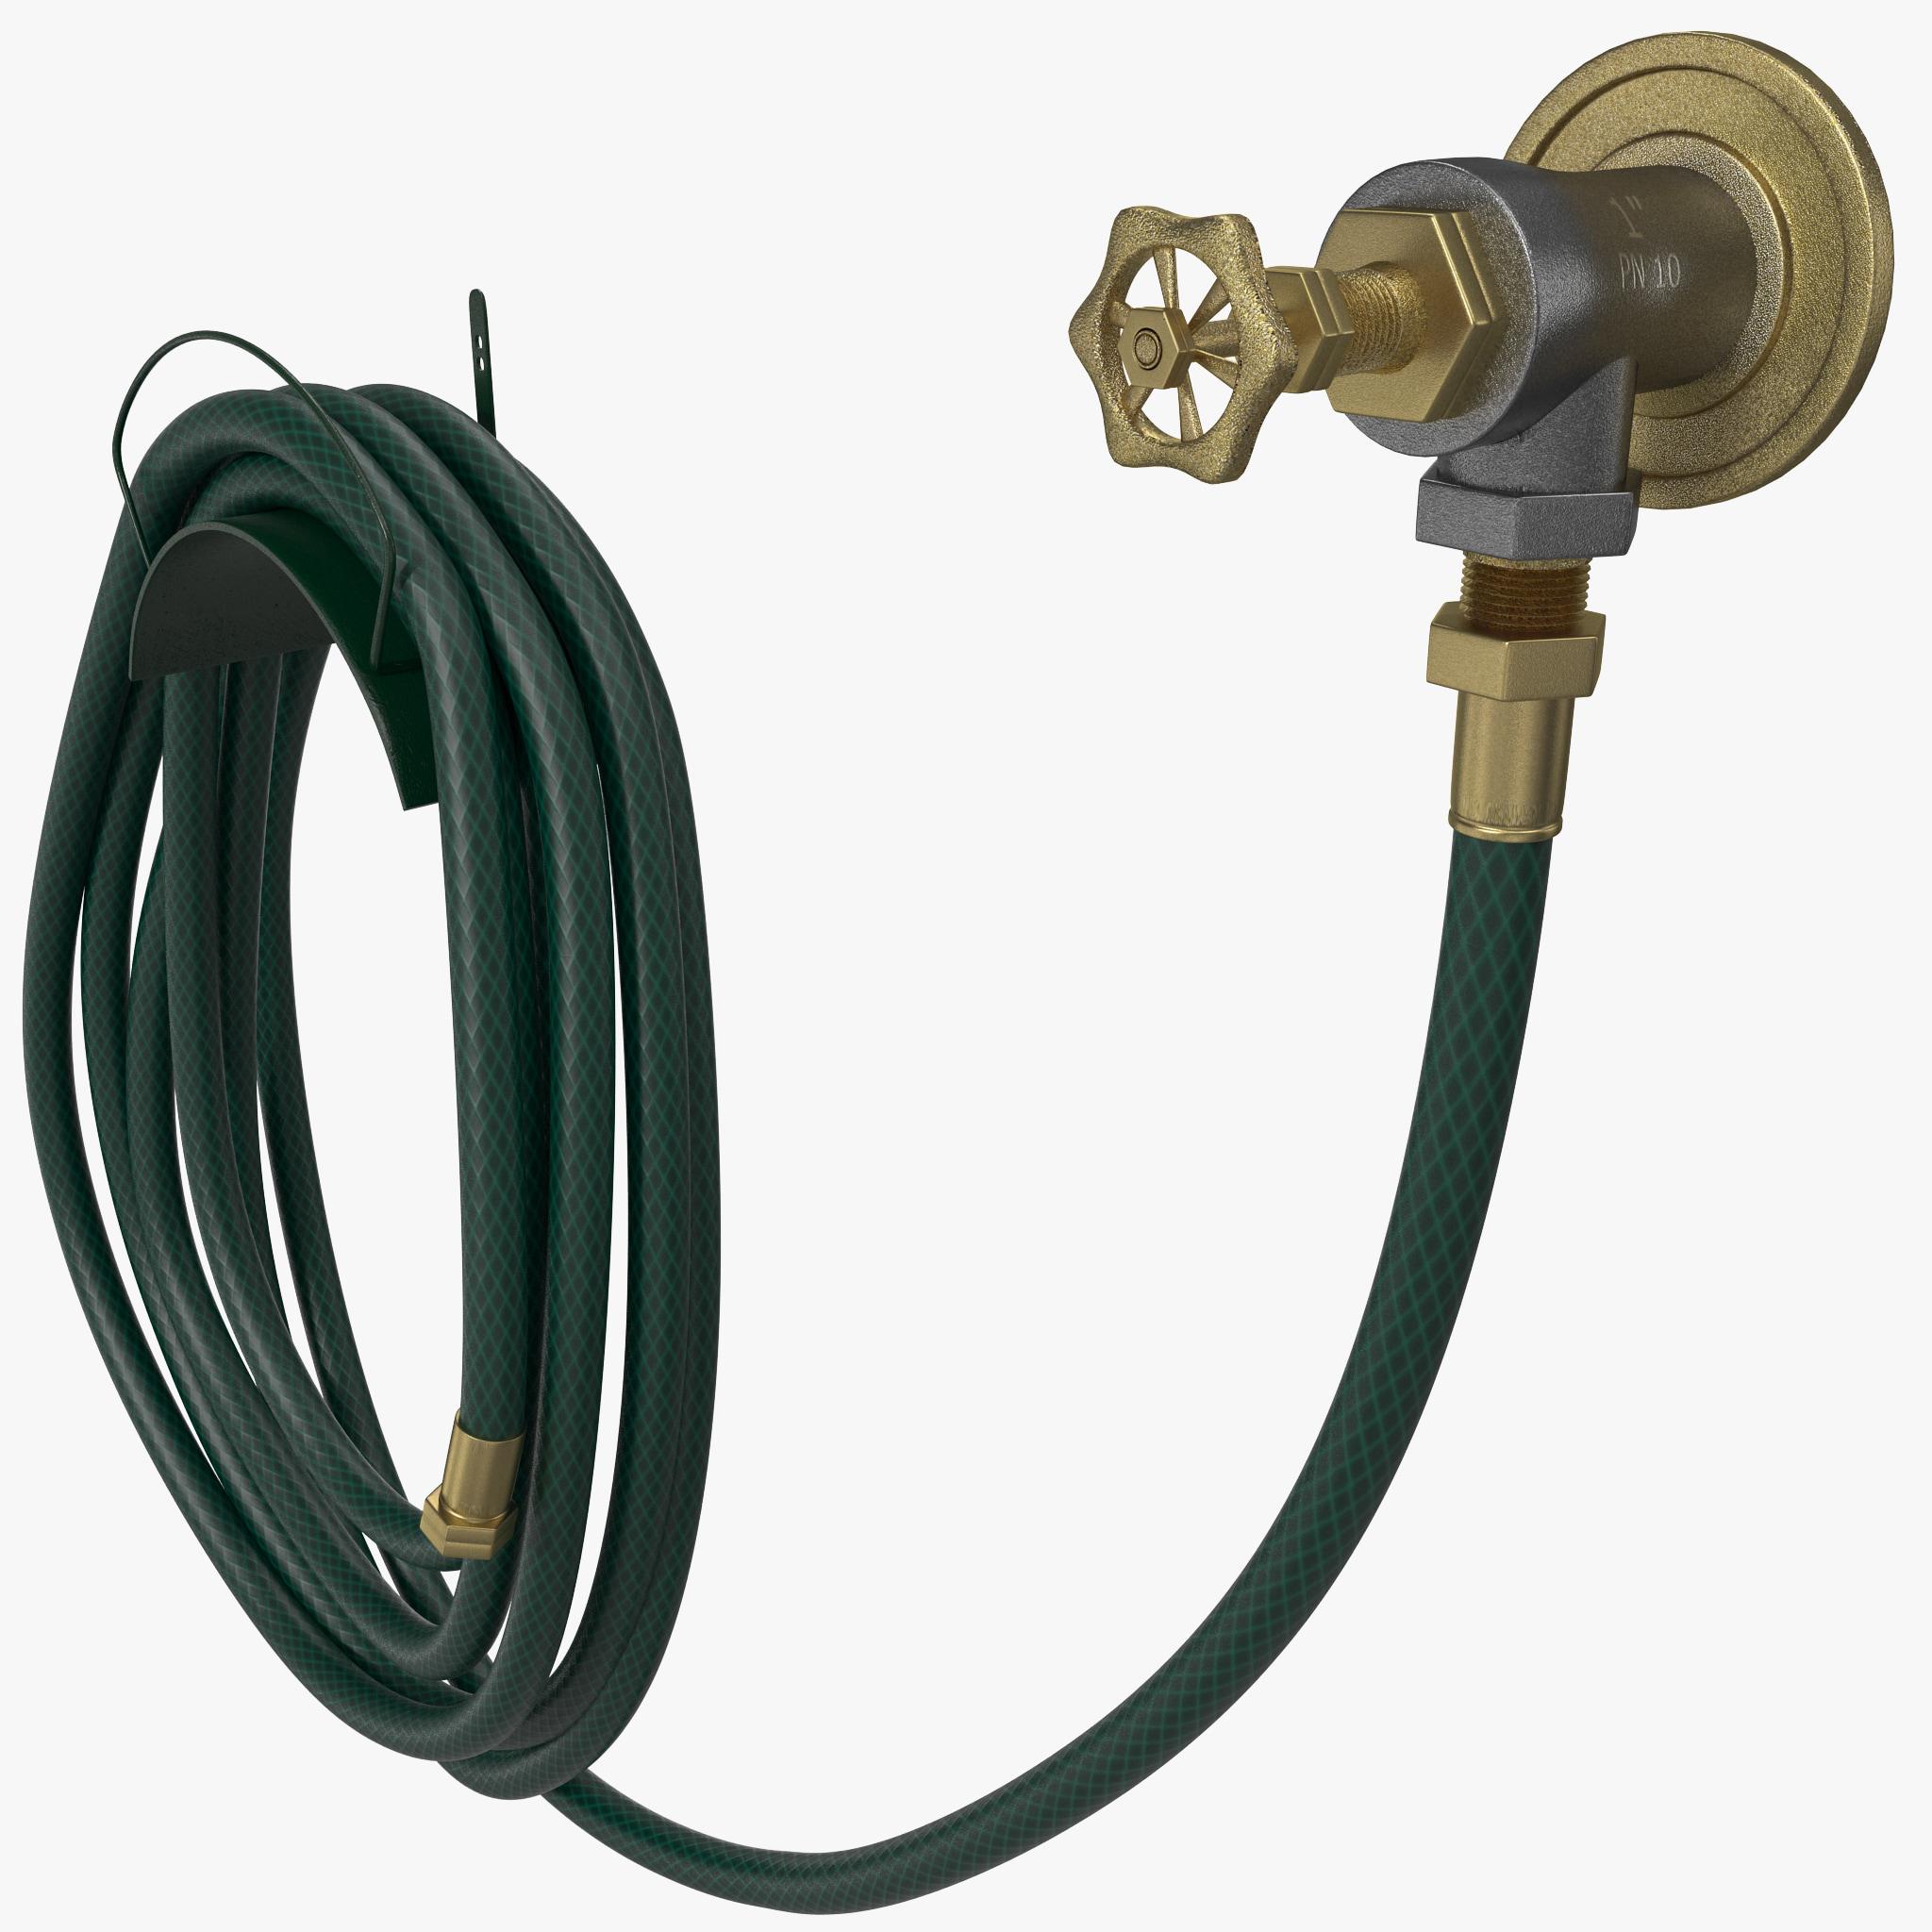 3dsmax garden hose